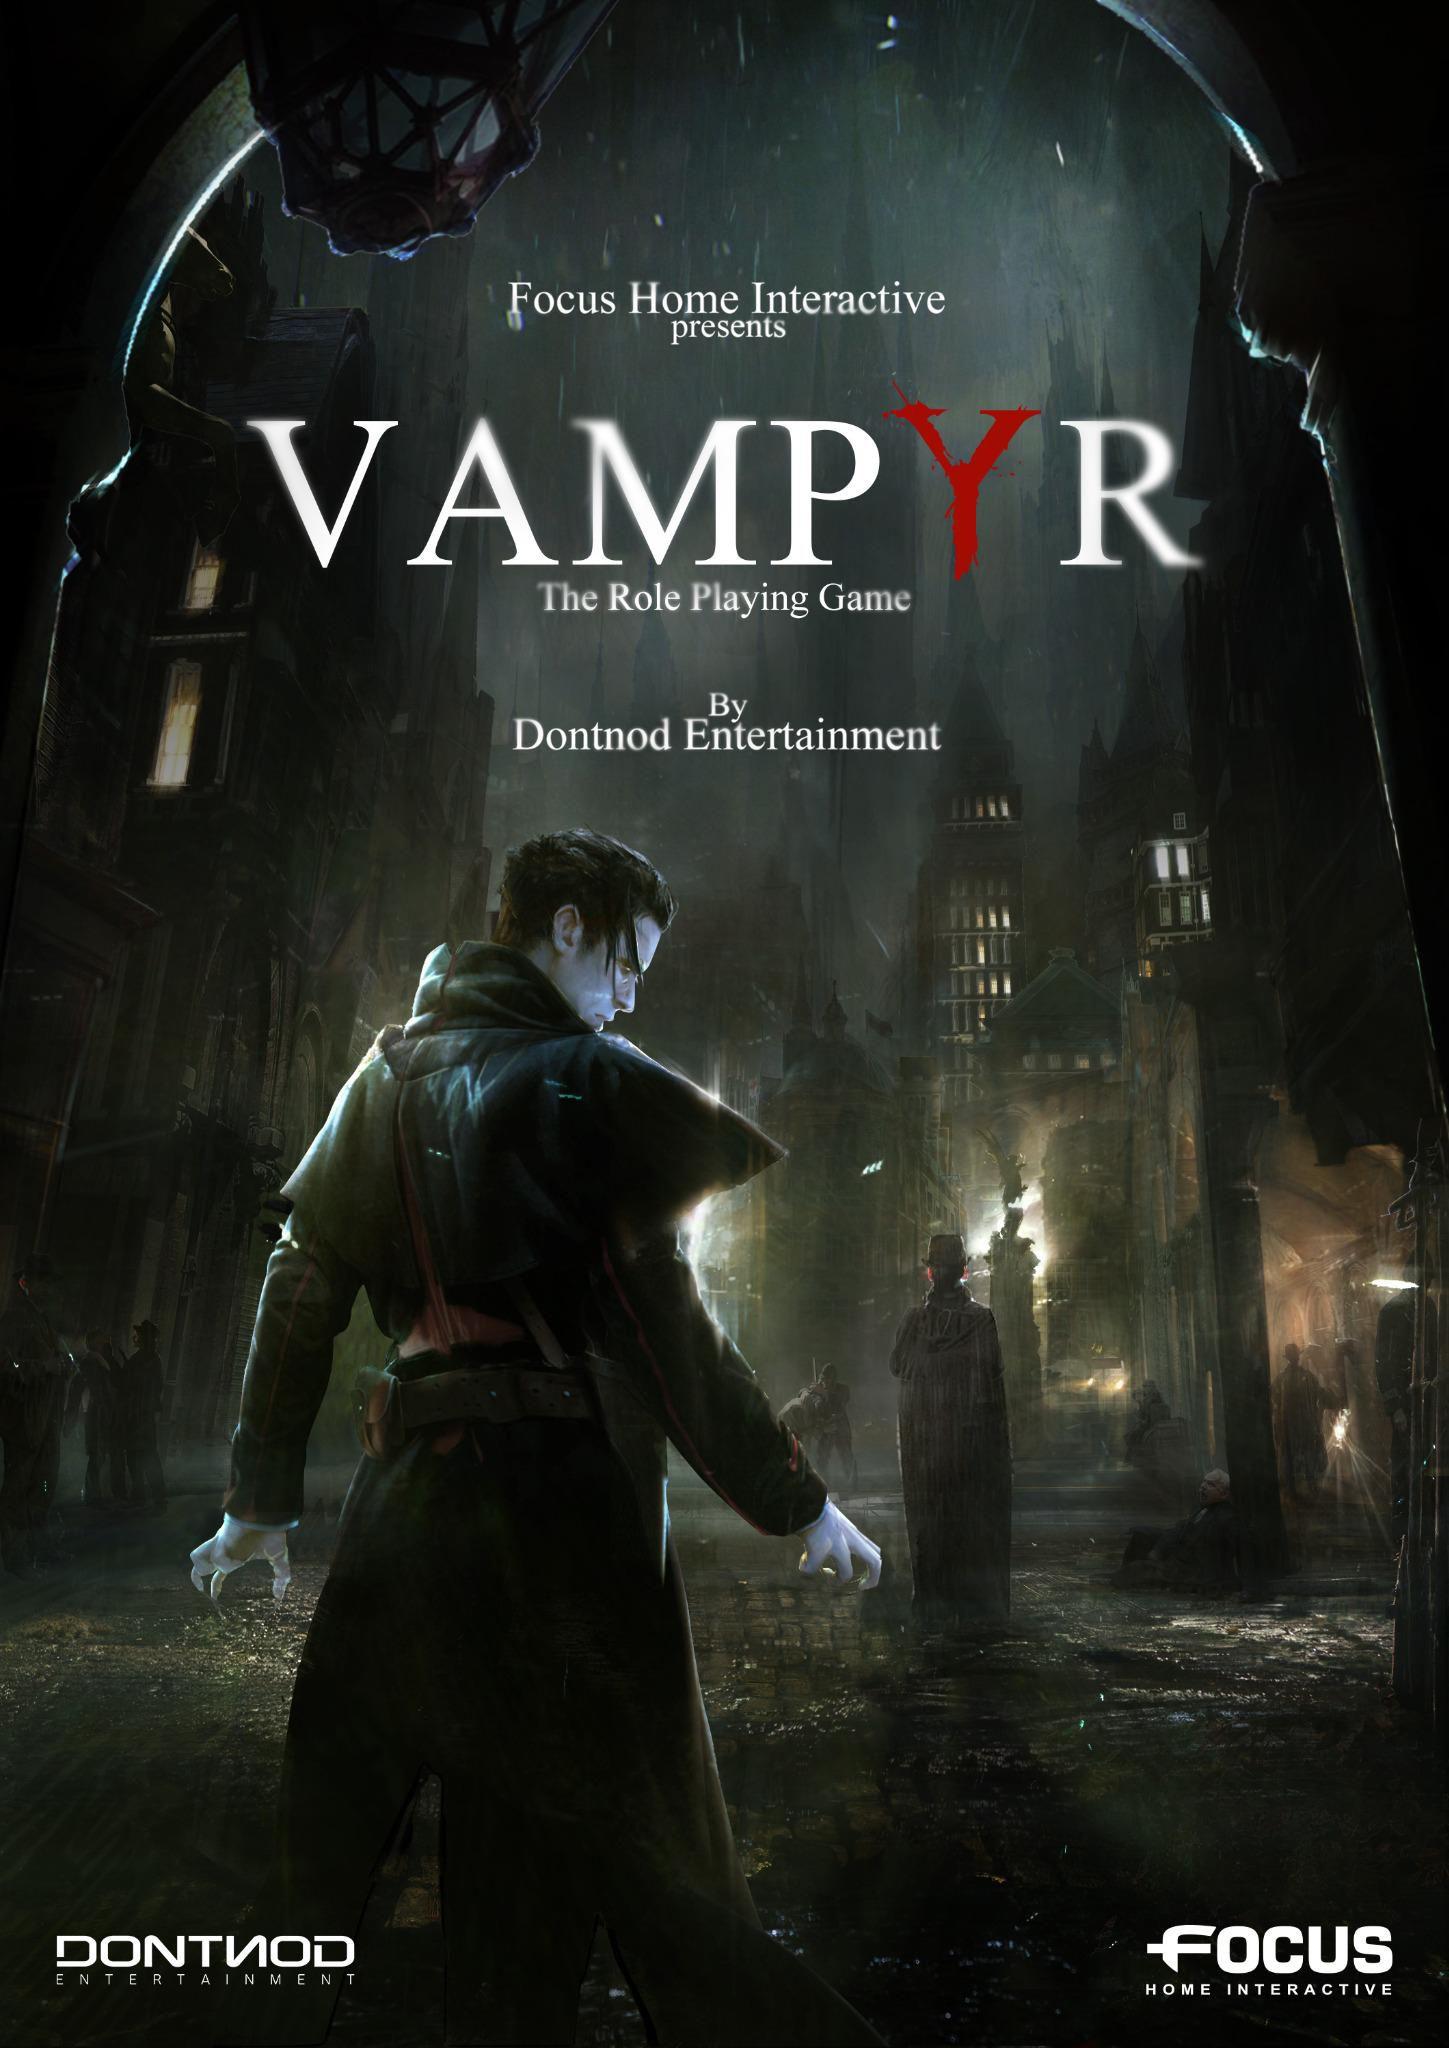 https://img5.downloadha.com/hosein/files/2018/06/Vampyr-pc-cover-large.jpg